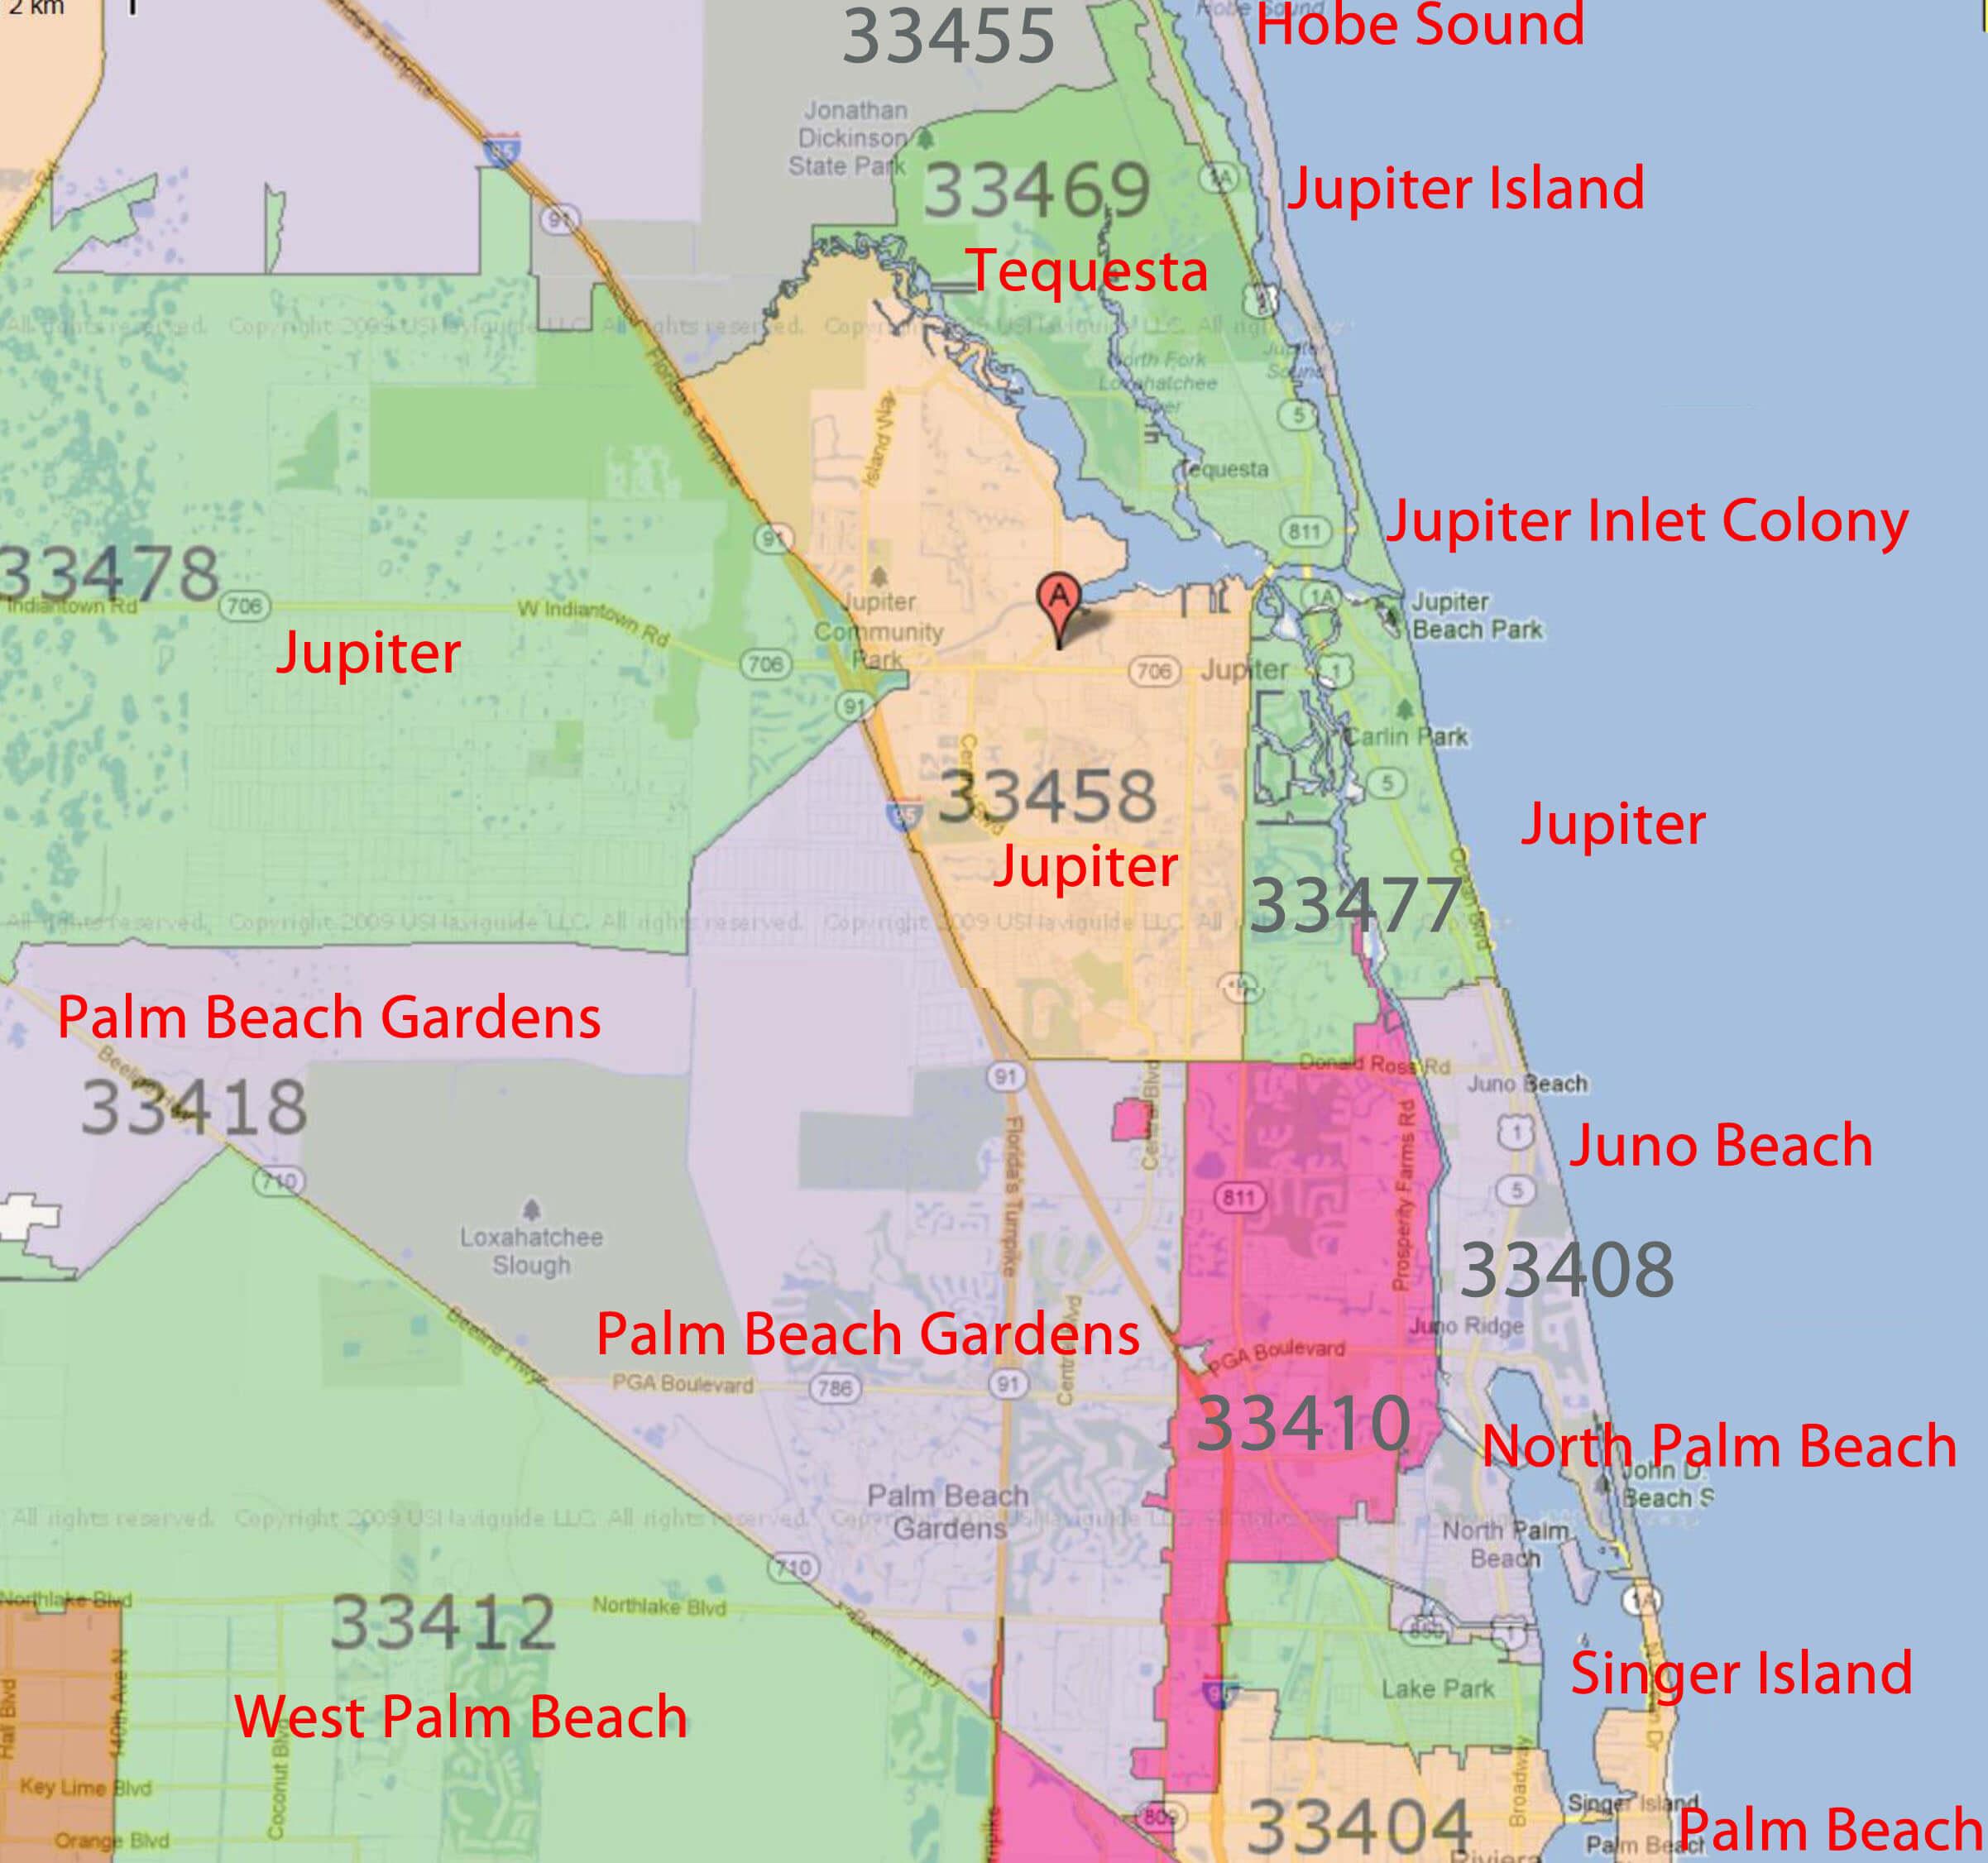 Palm Beach Gardens, Jupiter Florida Real Estatezip Code - Palm Beach Gardens Florida Map